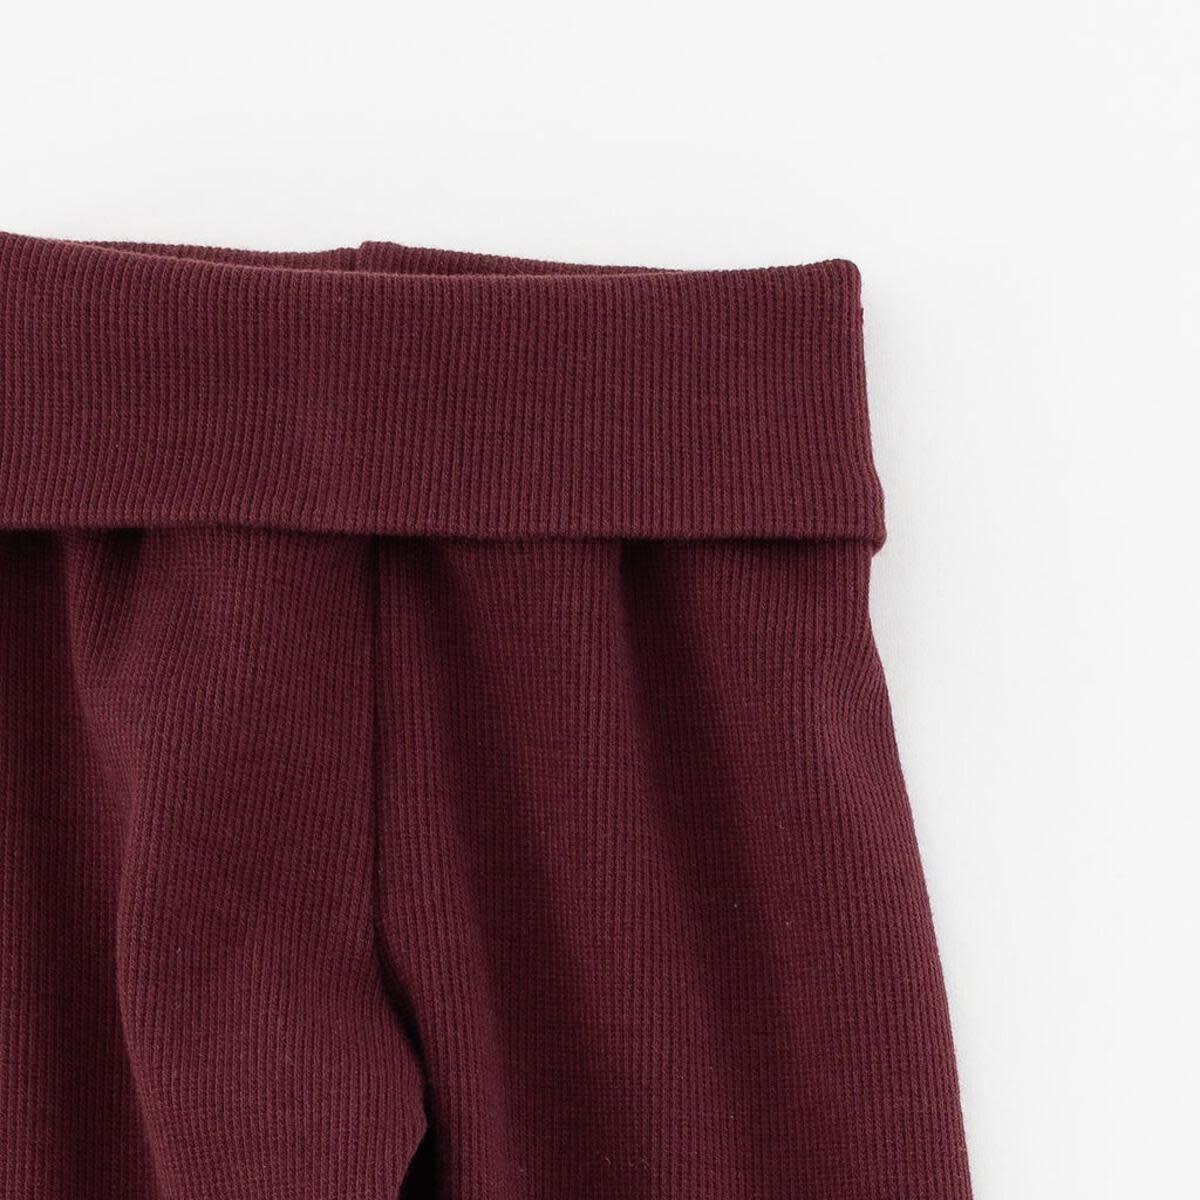 Thimble Thimble Legging Pant in Organic Ribbed Garnet